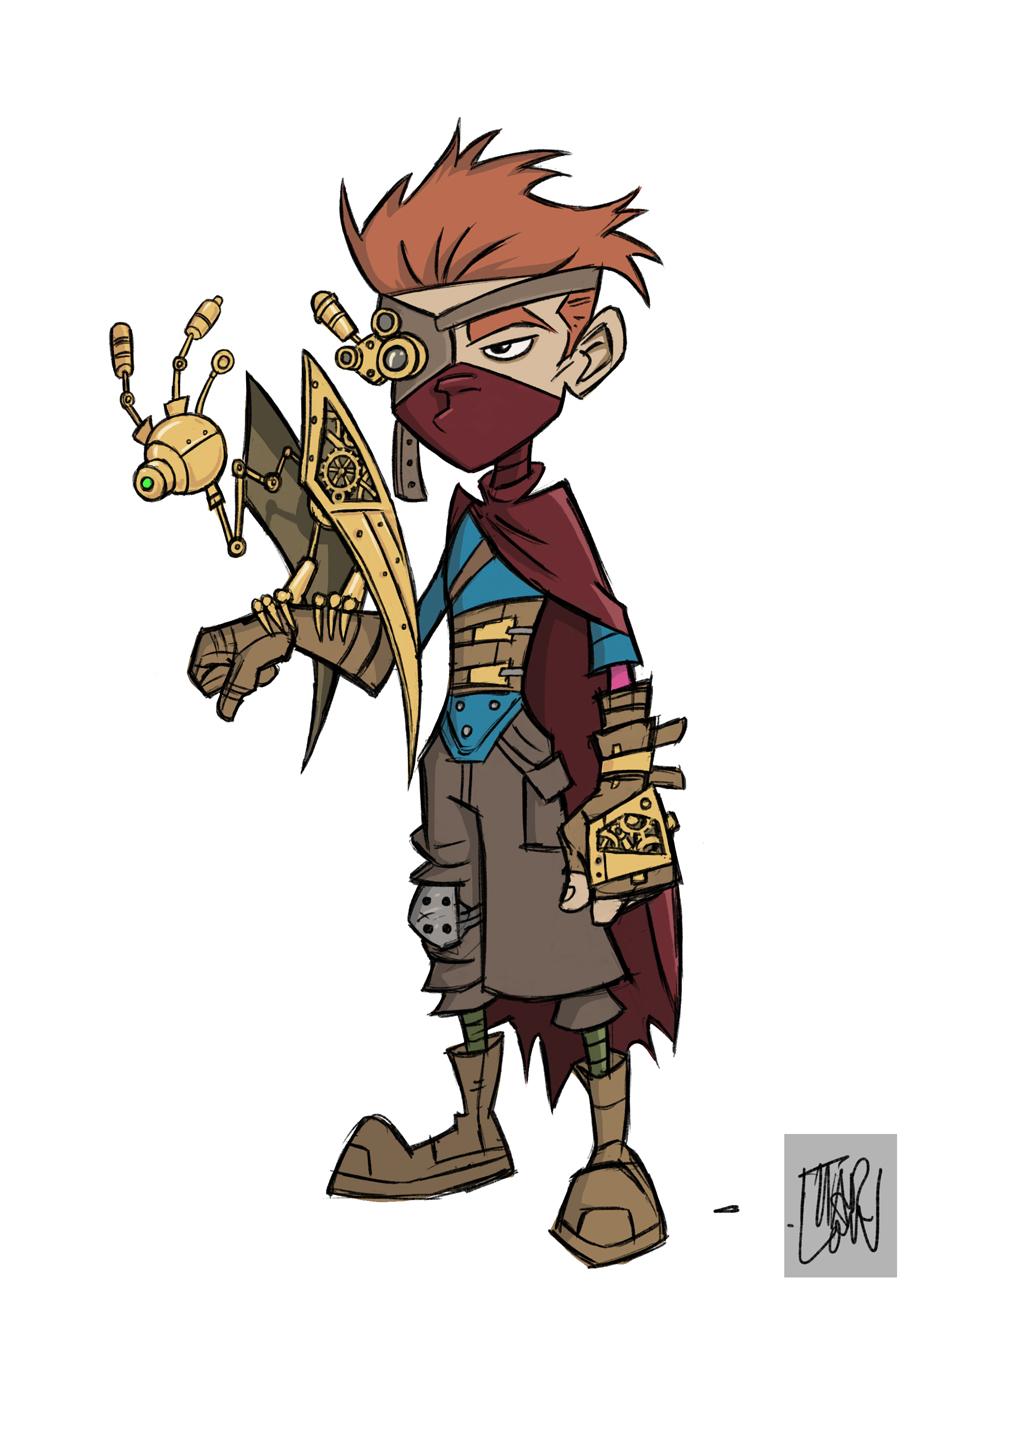 Character Design Vancouver : Marlon deane art character design